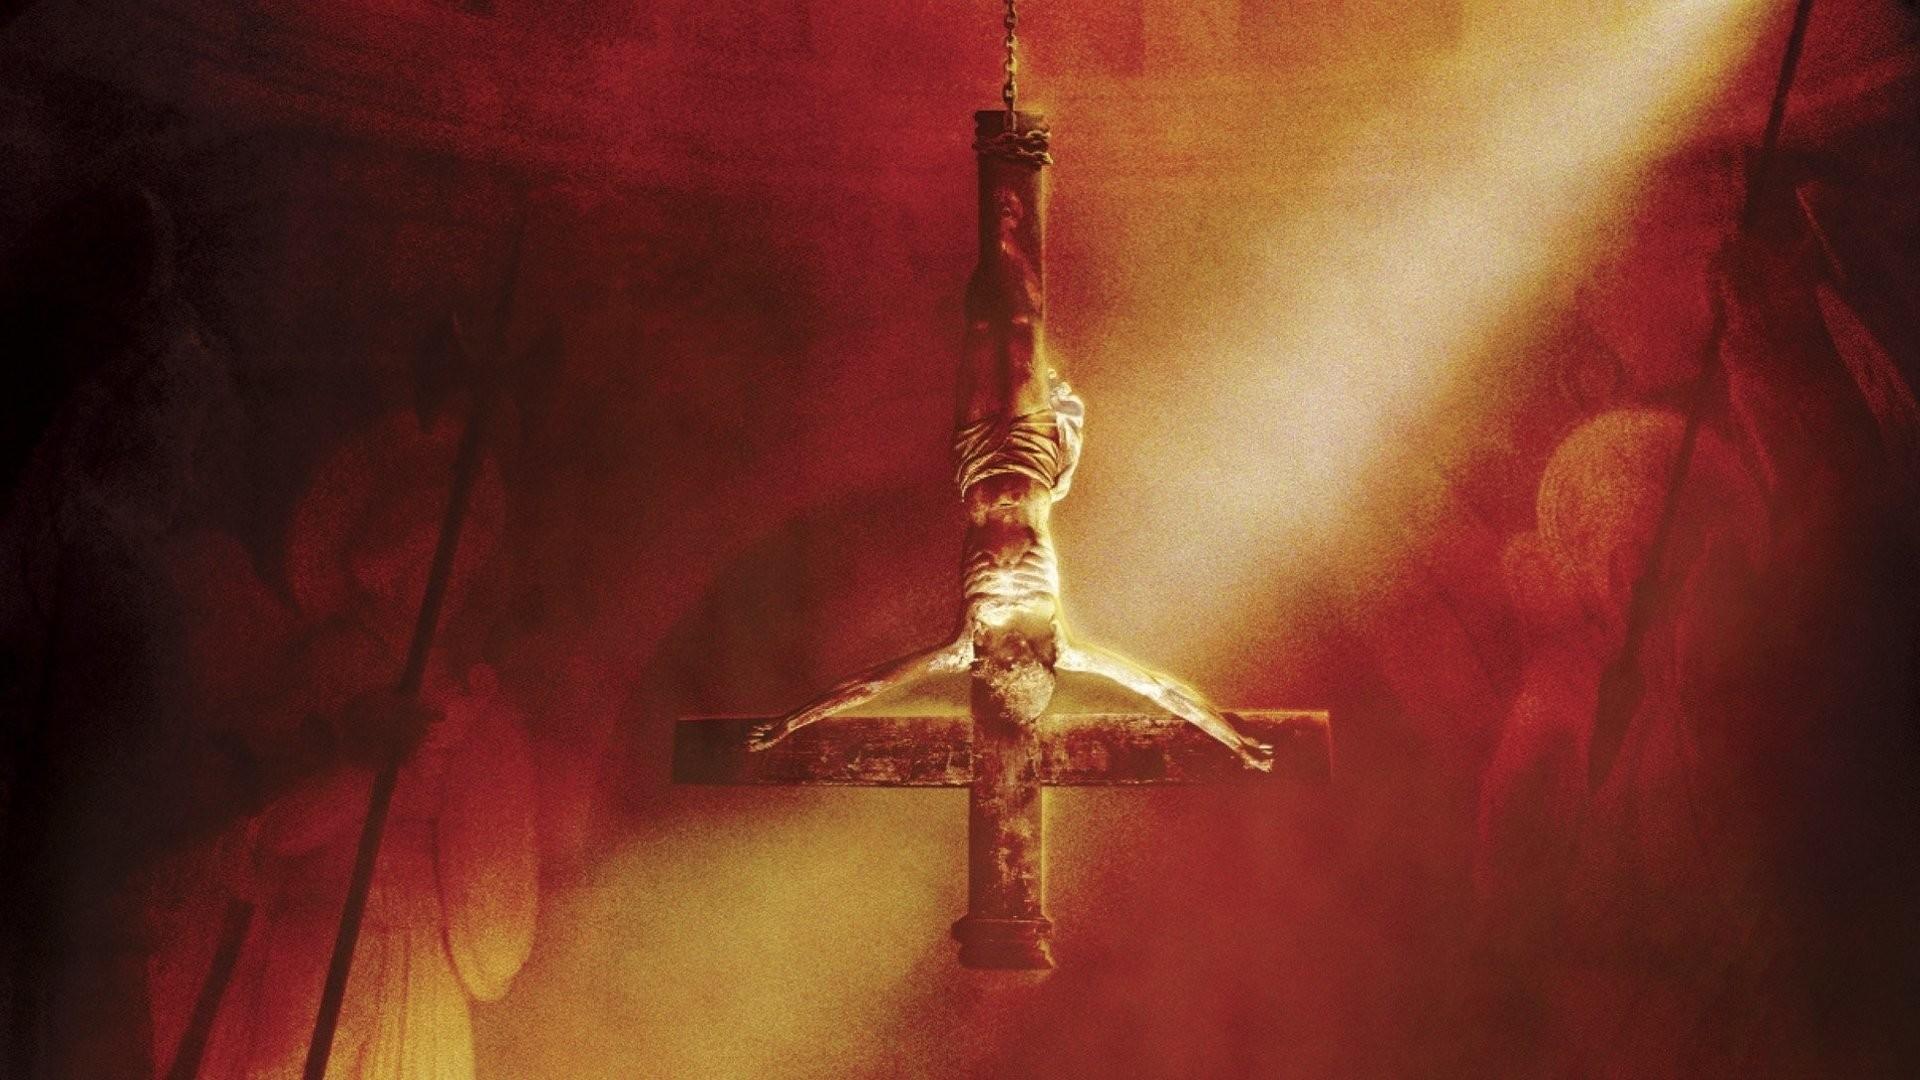 Res: 1920x1080,  Movie - Dominion: Prequel to the Exorcist Wallpaper